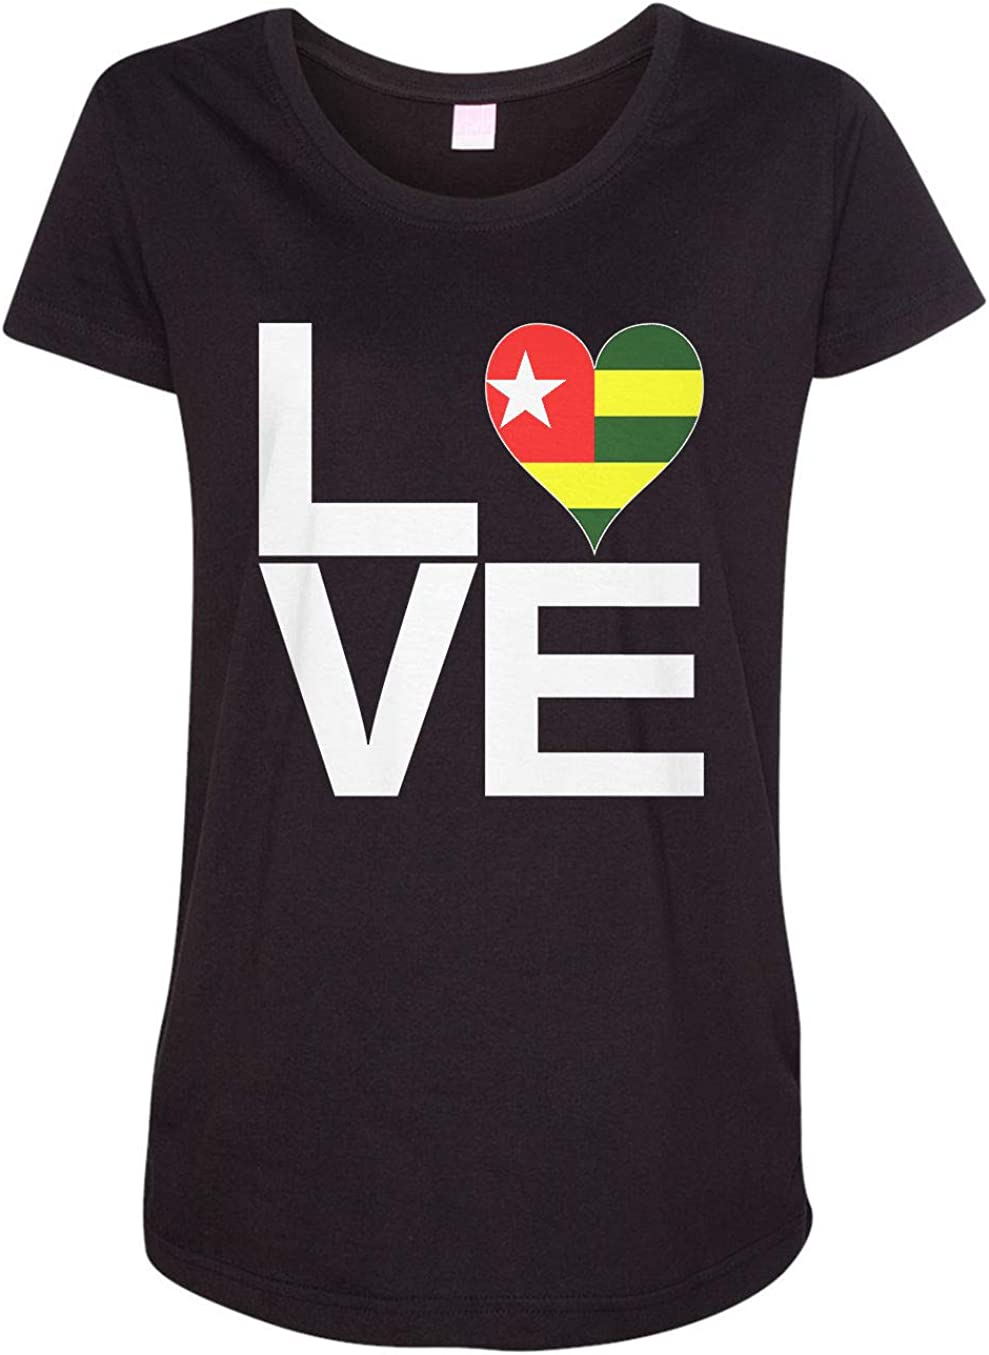 HARD EDGE DESIGN Women's Love Block Togo Heart T-Shirt